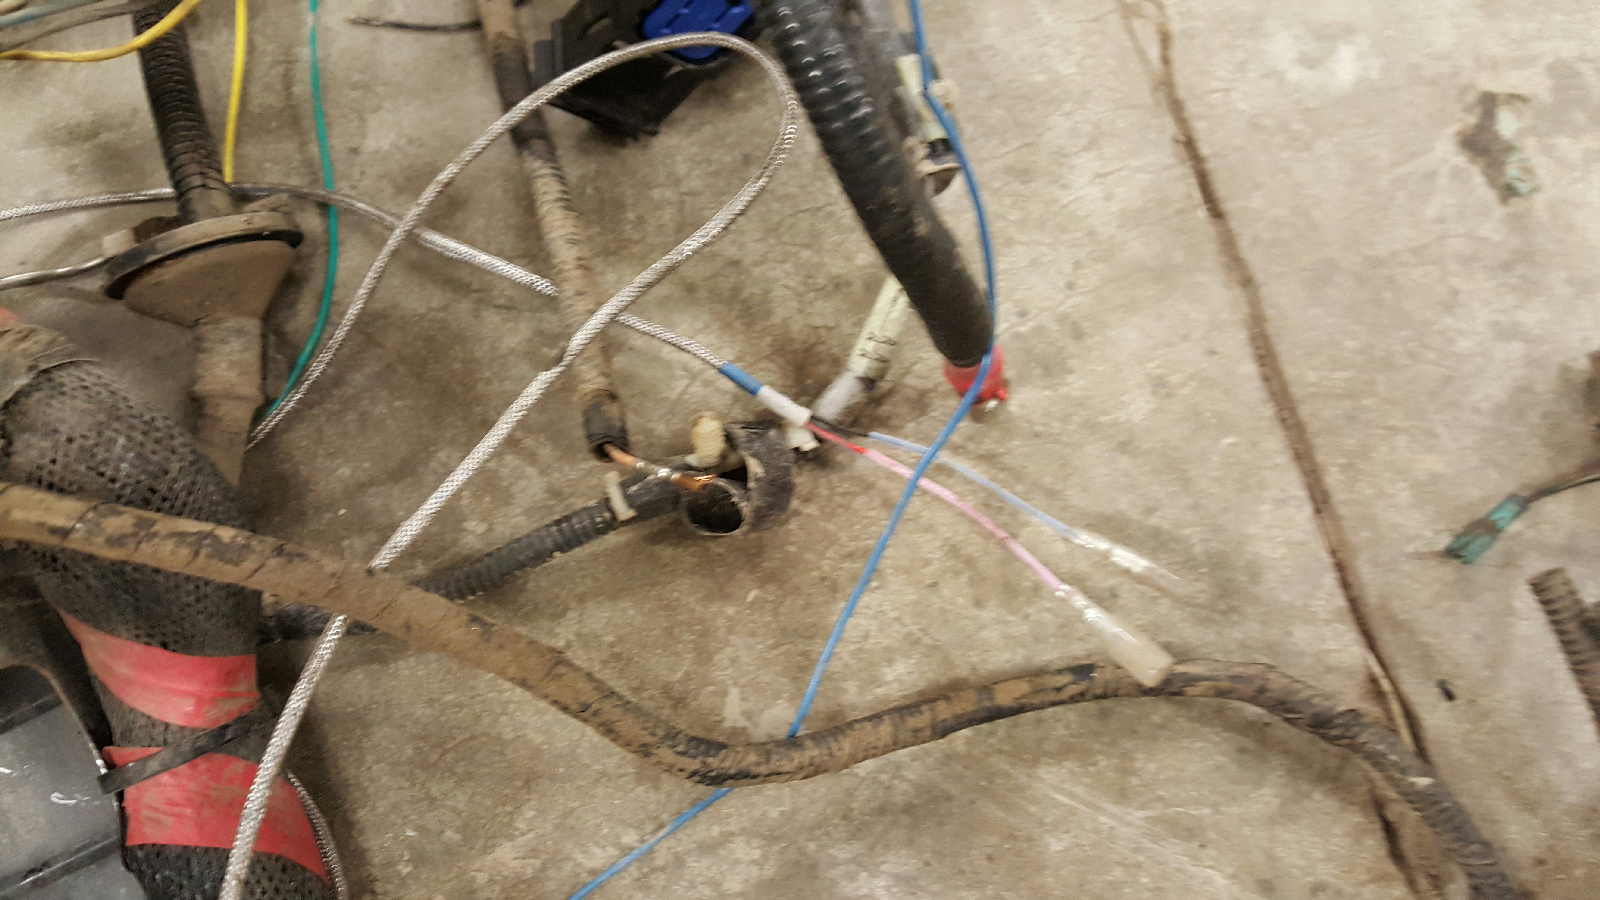 7 3 wiring diagram f350 1999 7 3 wiring harness 1999 2000 2001 2002 2003 ford f250 f350 7.3l engine ...